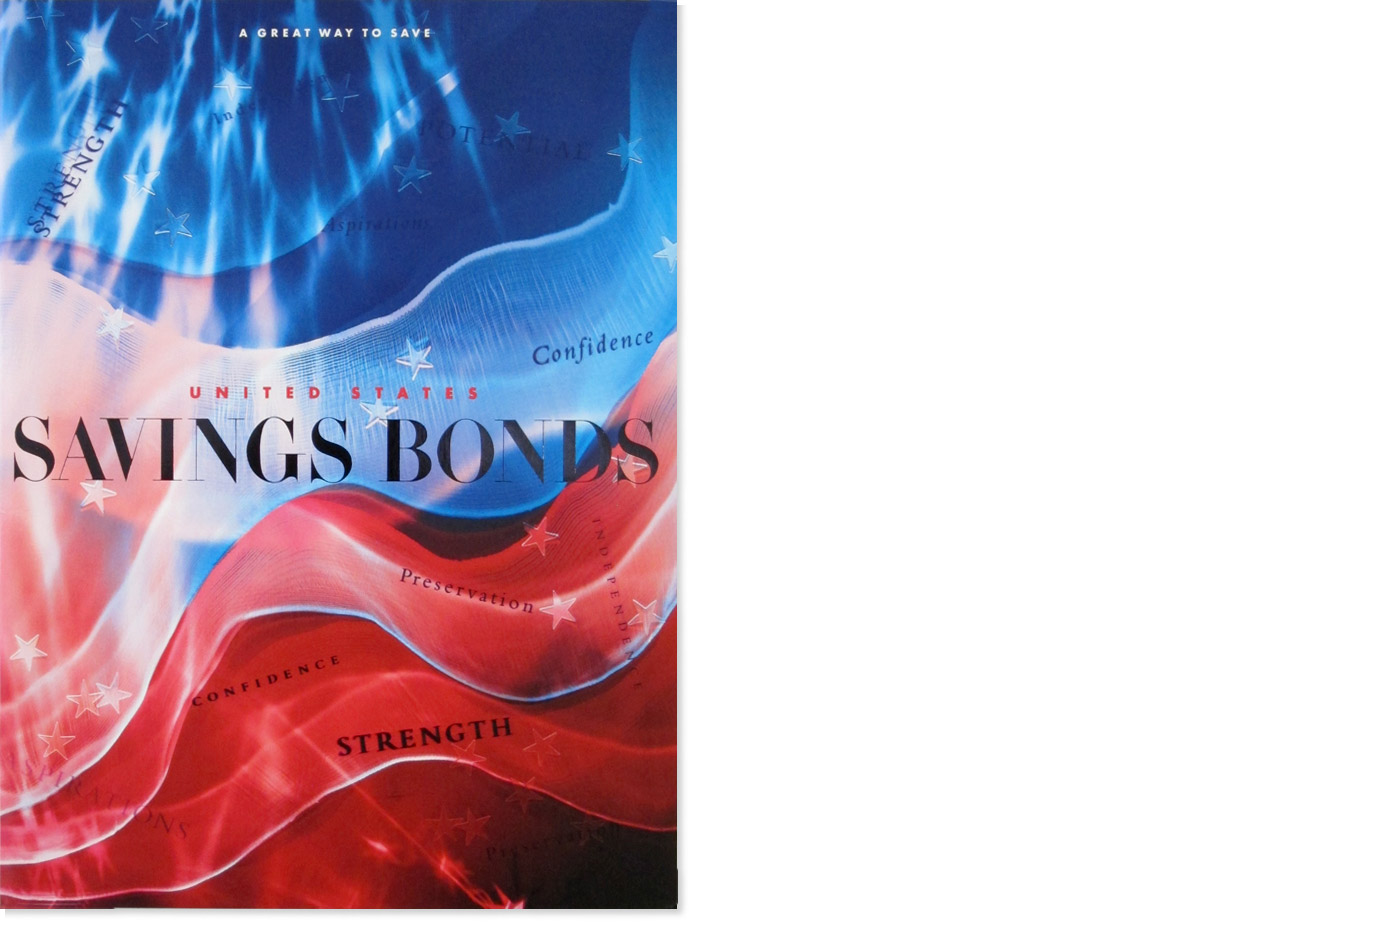 Chevron U.S. Savings Bonds Brochure